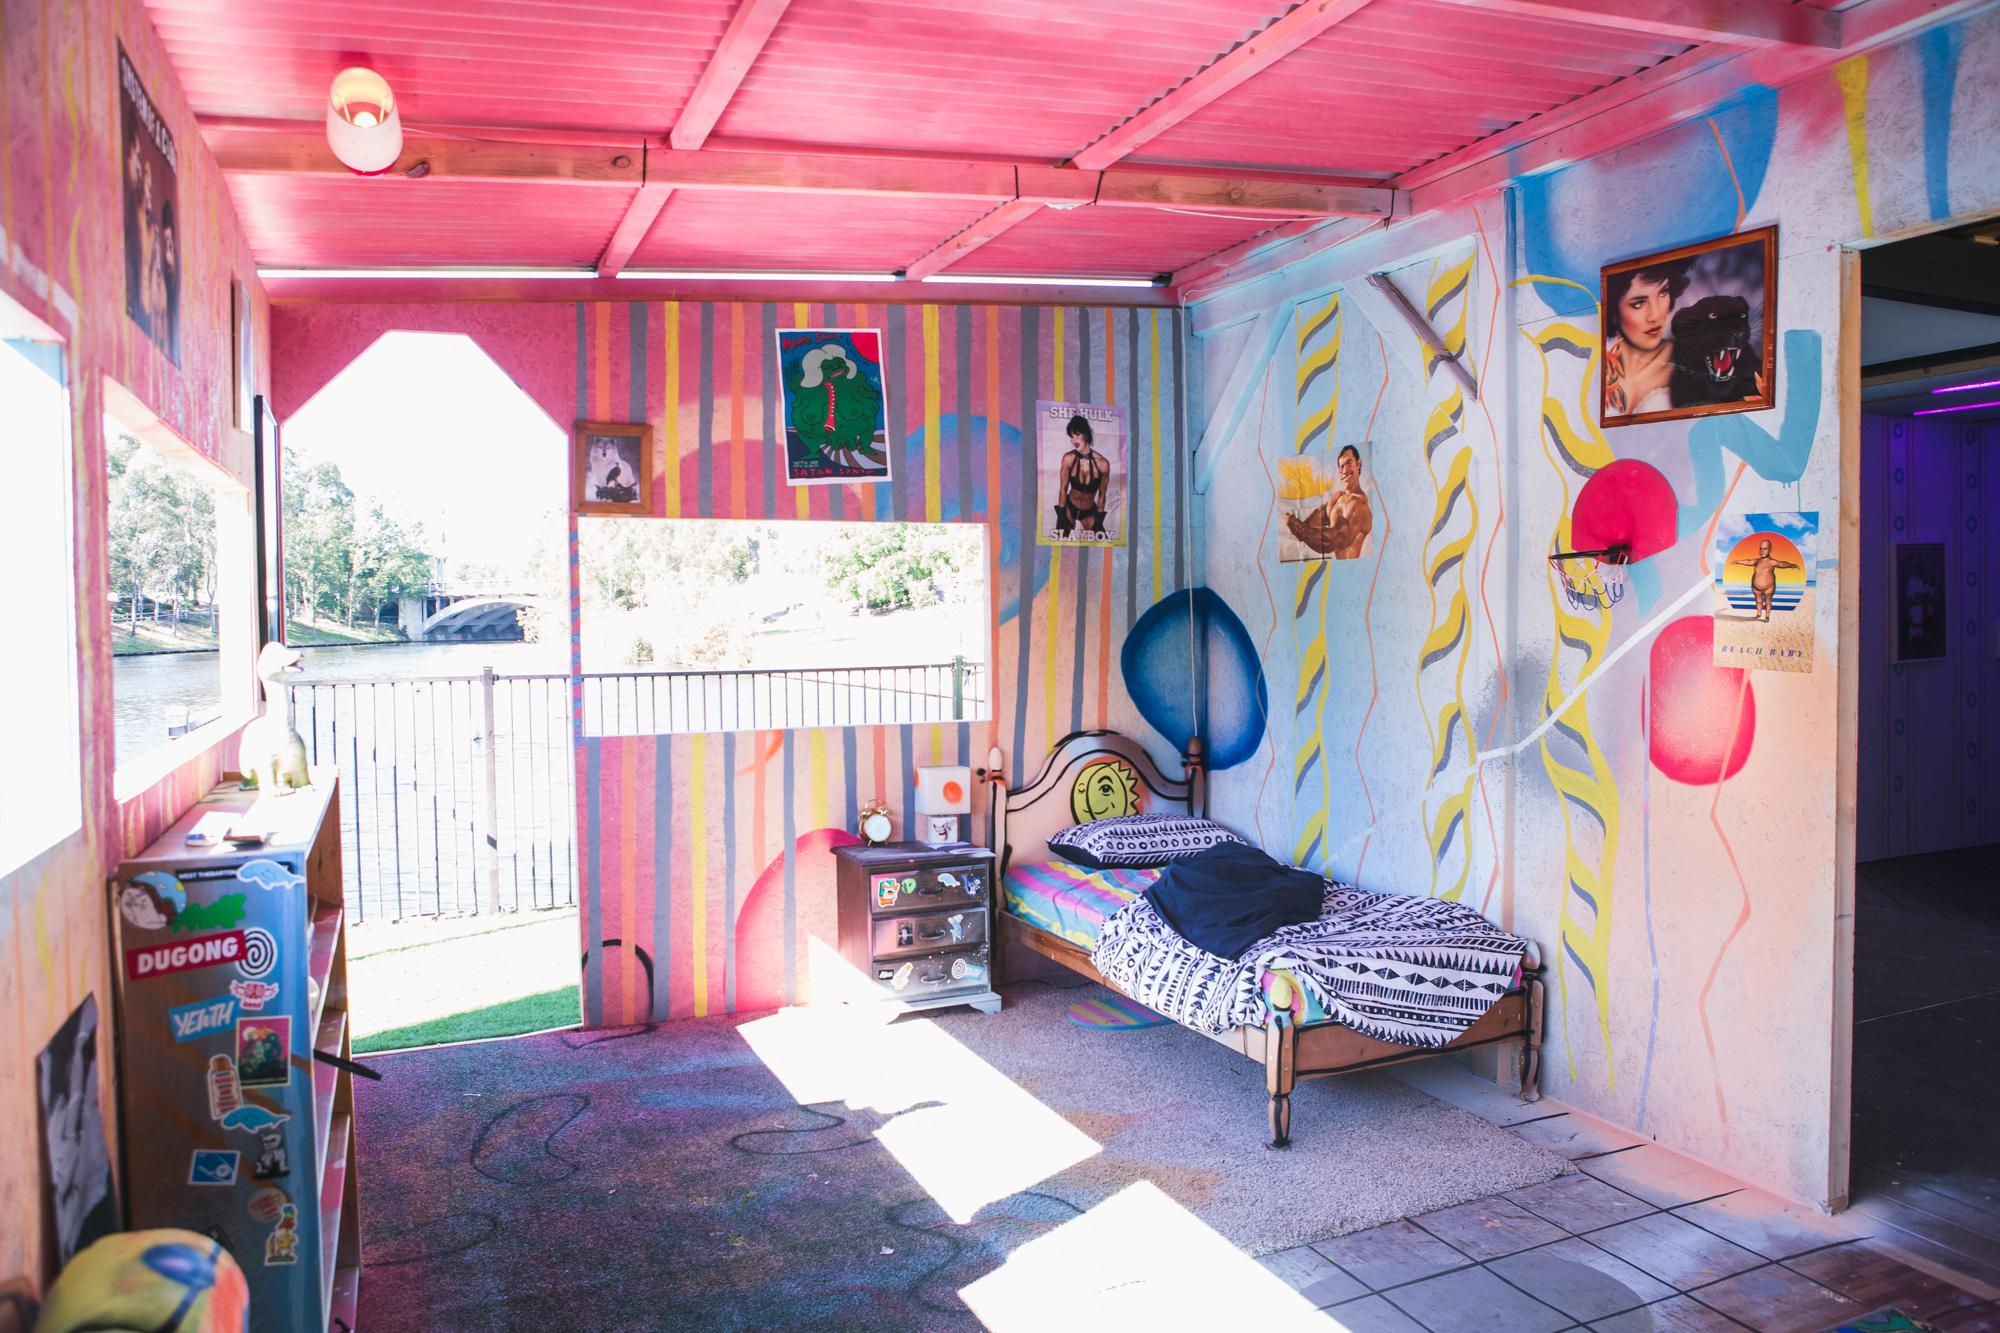 Archies room 2-00014.jpg